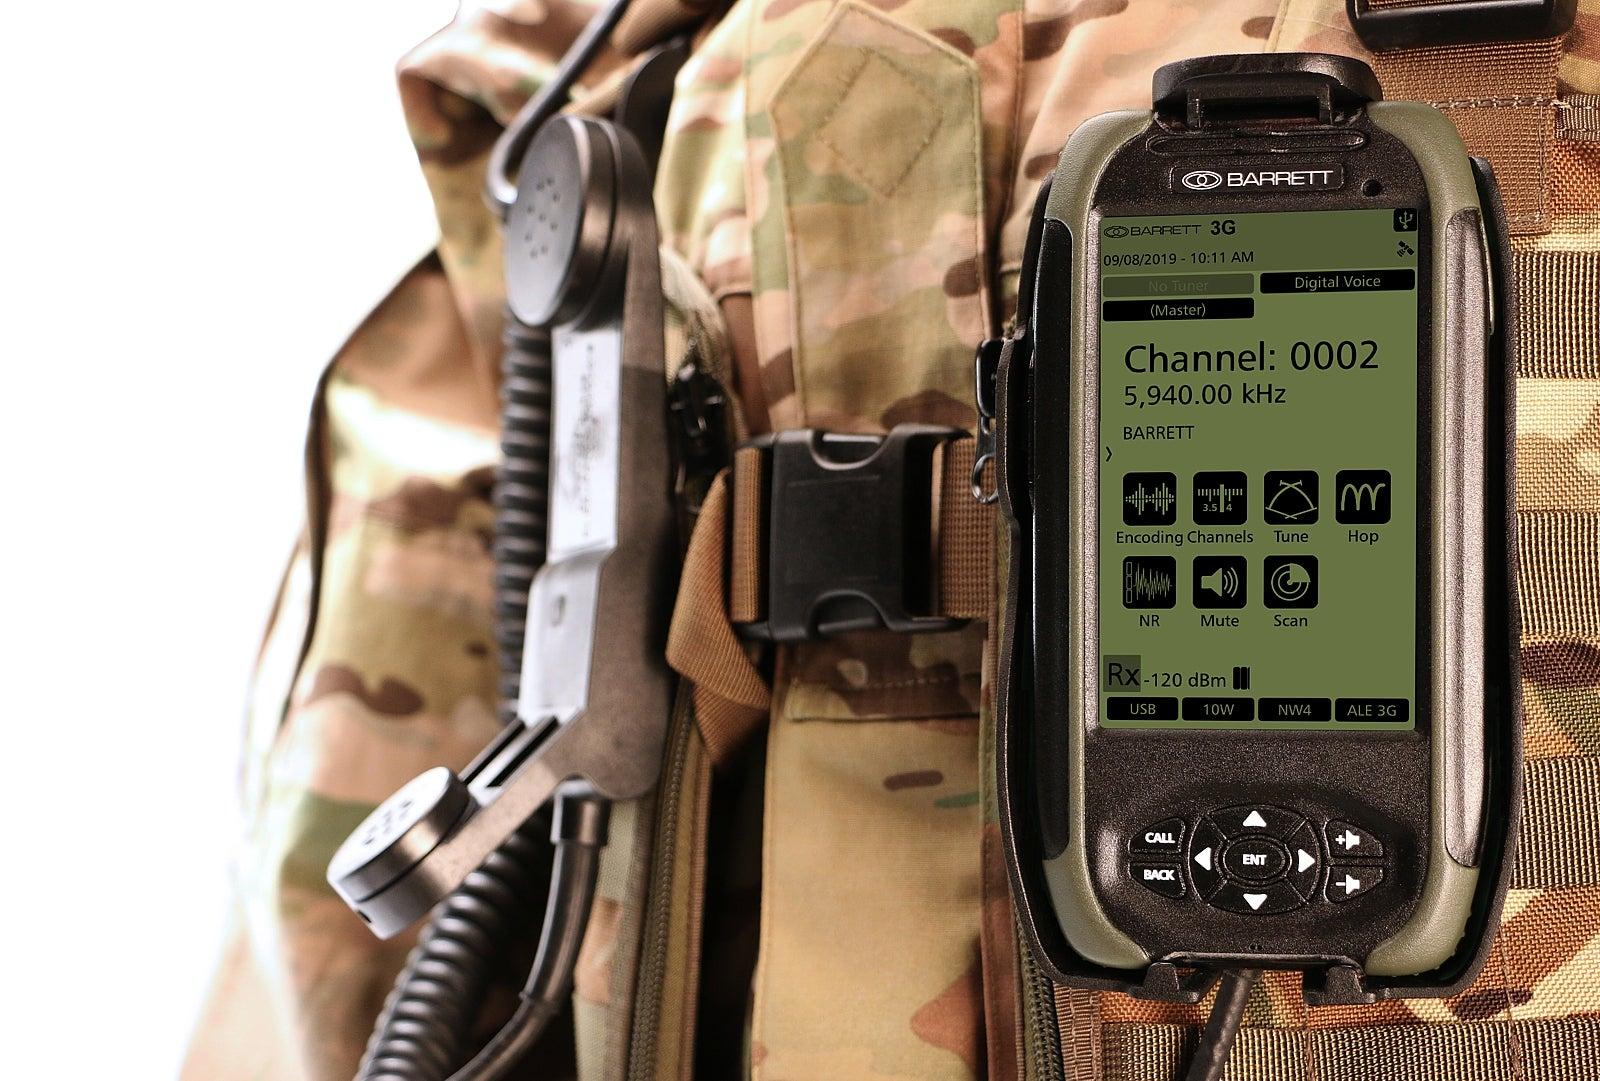 PRC-4090 Control Handset with webbing